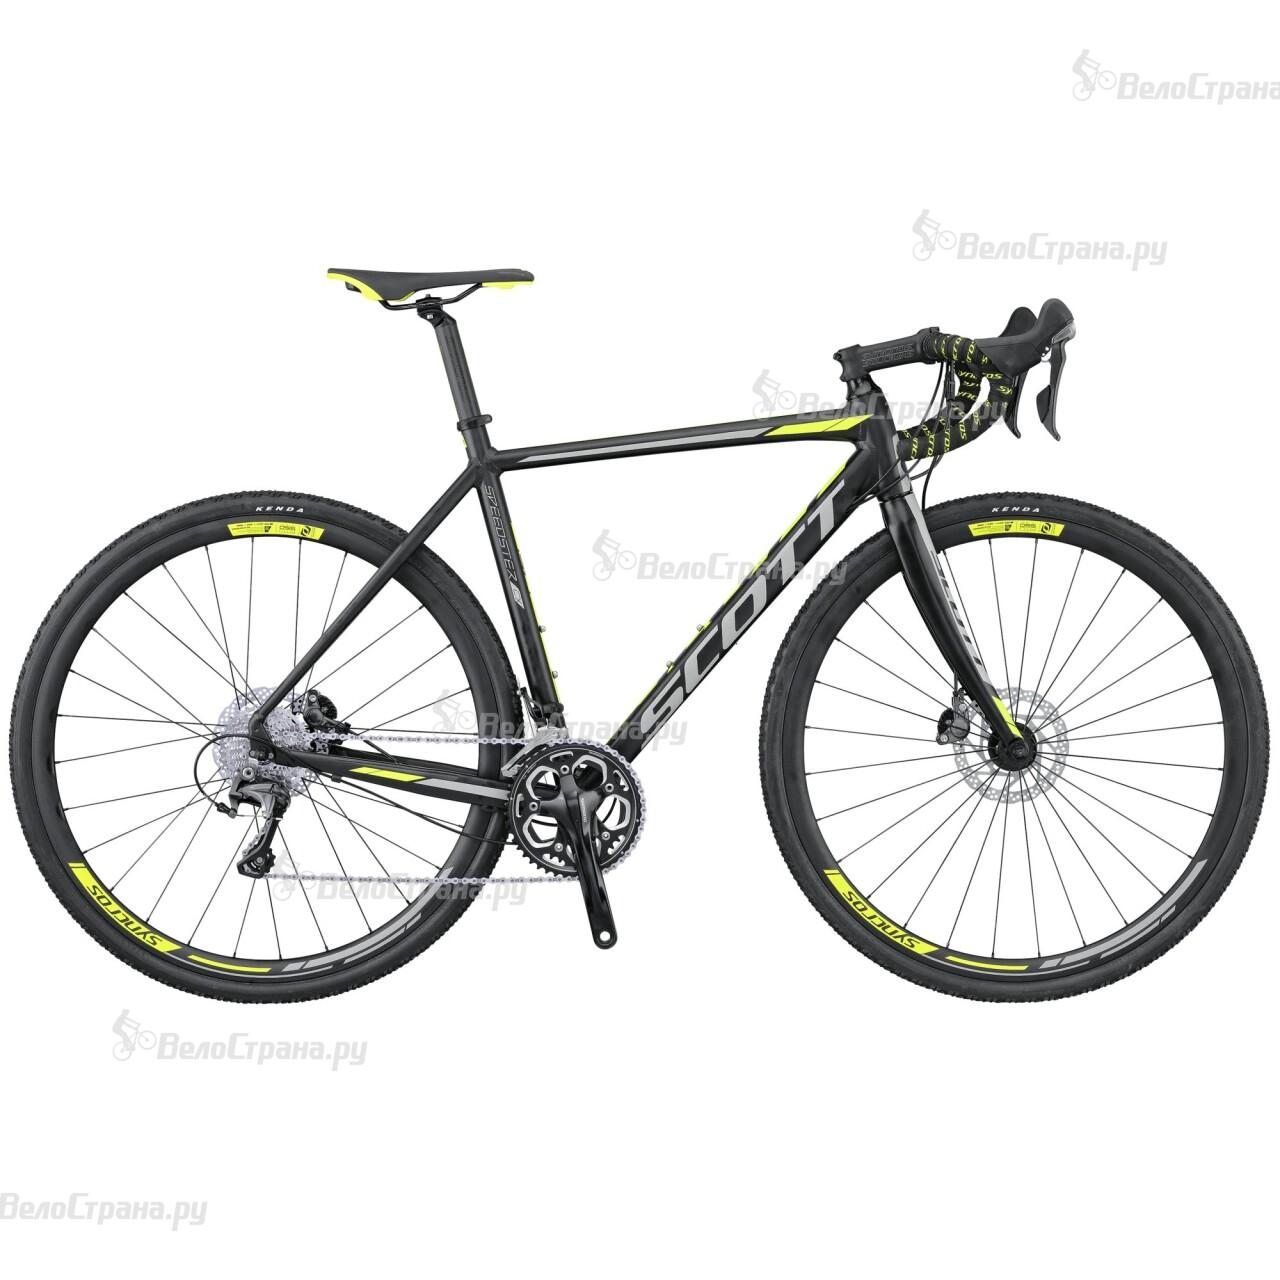 Велосипед Scott Speedster CX 10 Disc (2016) велосипед scott speedster cx 20 disc 28 2016